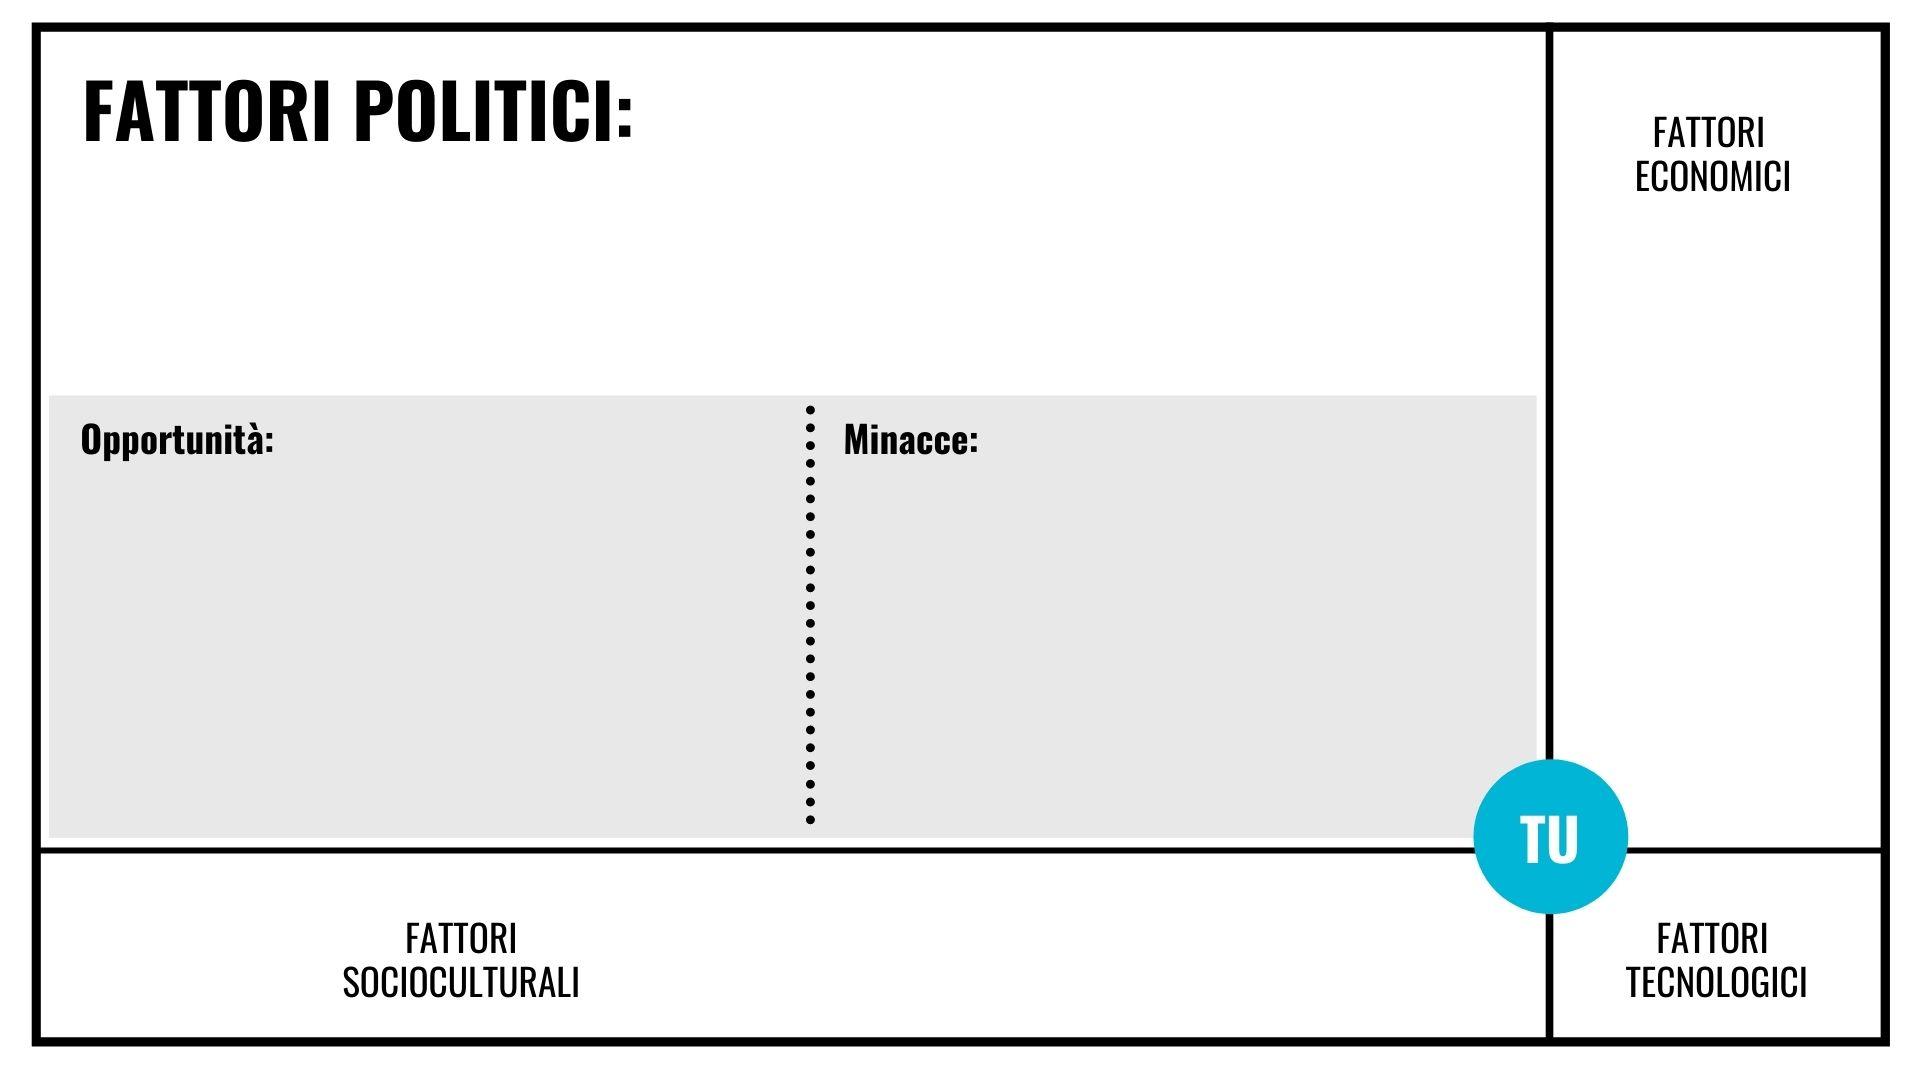 Matrice analisi PEST Fattori politici